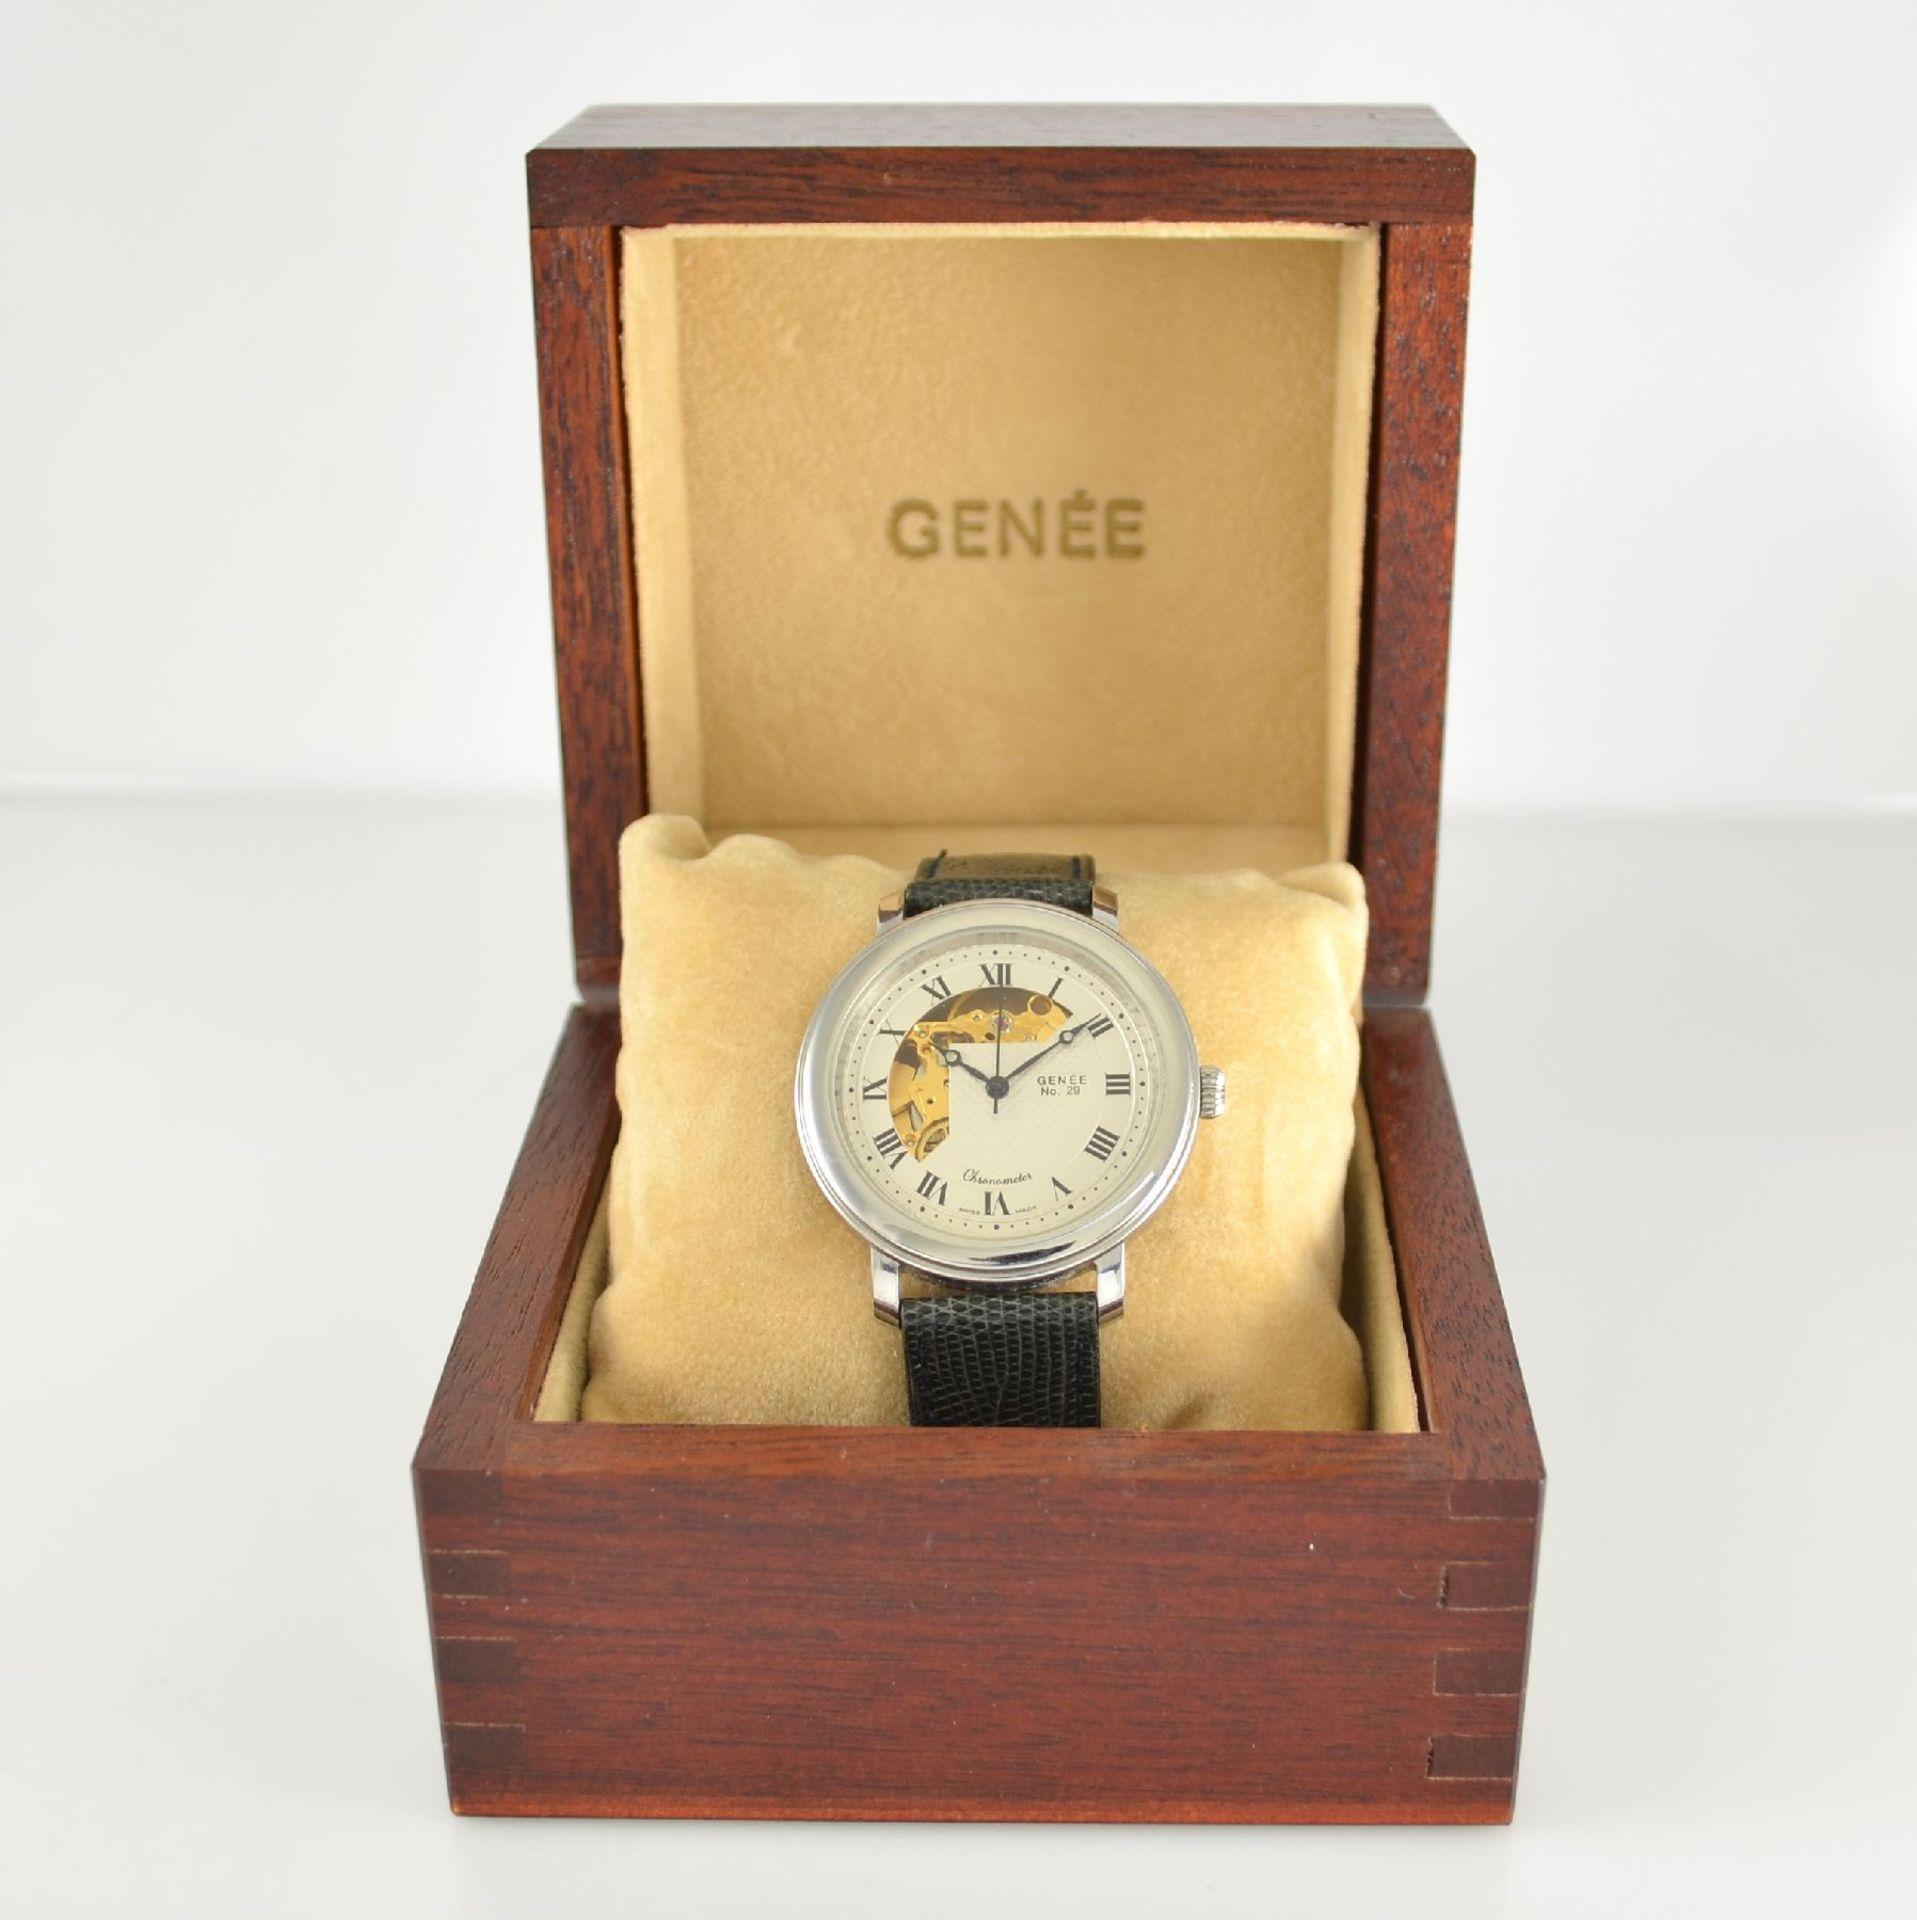 GENÉE No. 29 Chronometer-Herrenarmbanduhr in Stahl, Schweiz lt. beiliegendem Chronometerzertifikat - Bild 7 aus 8